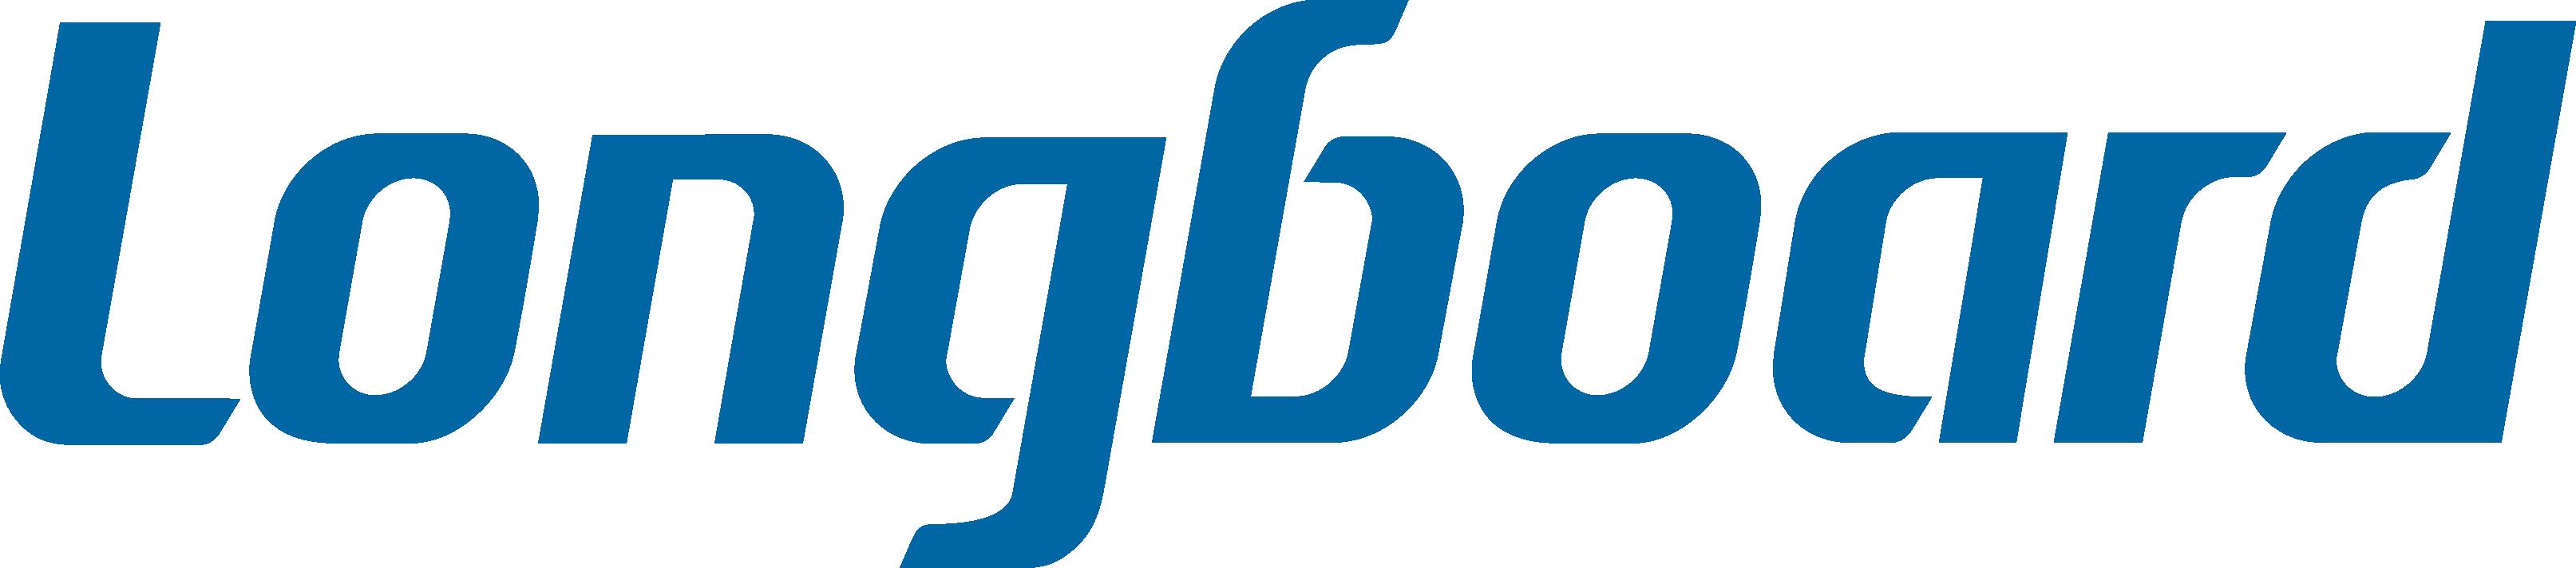 longboard rebranding - transition logo